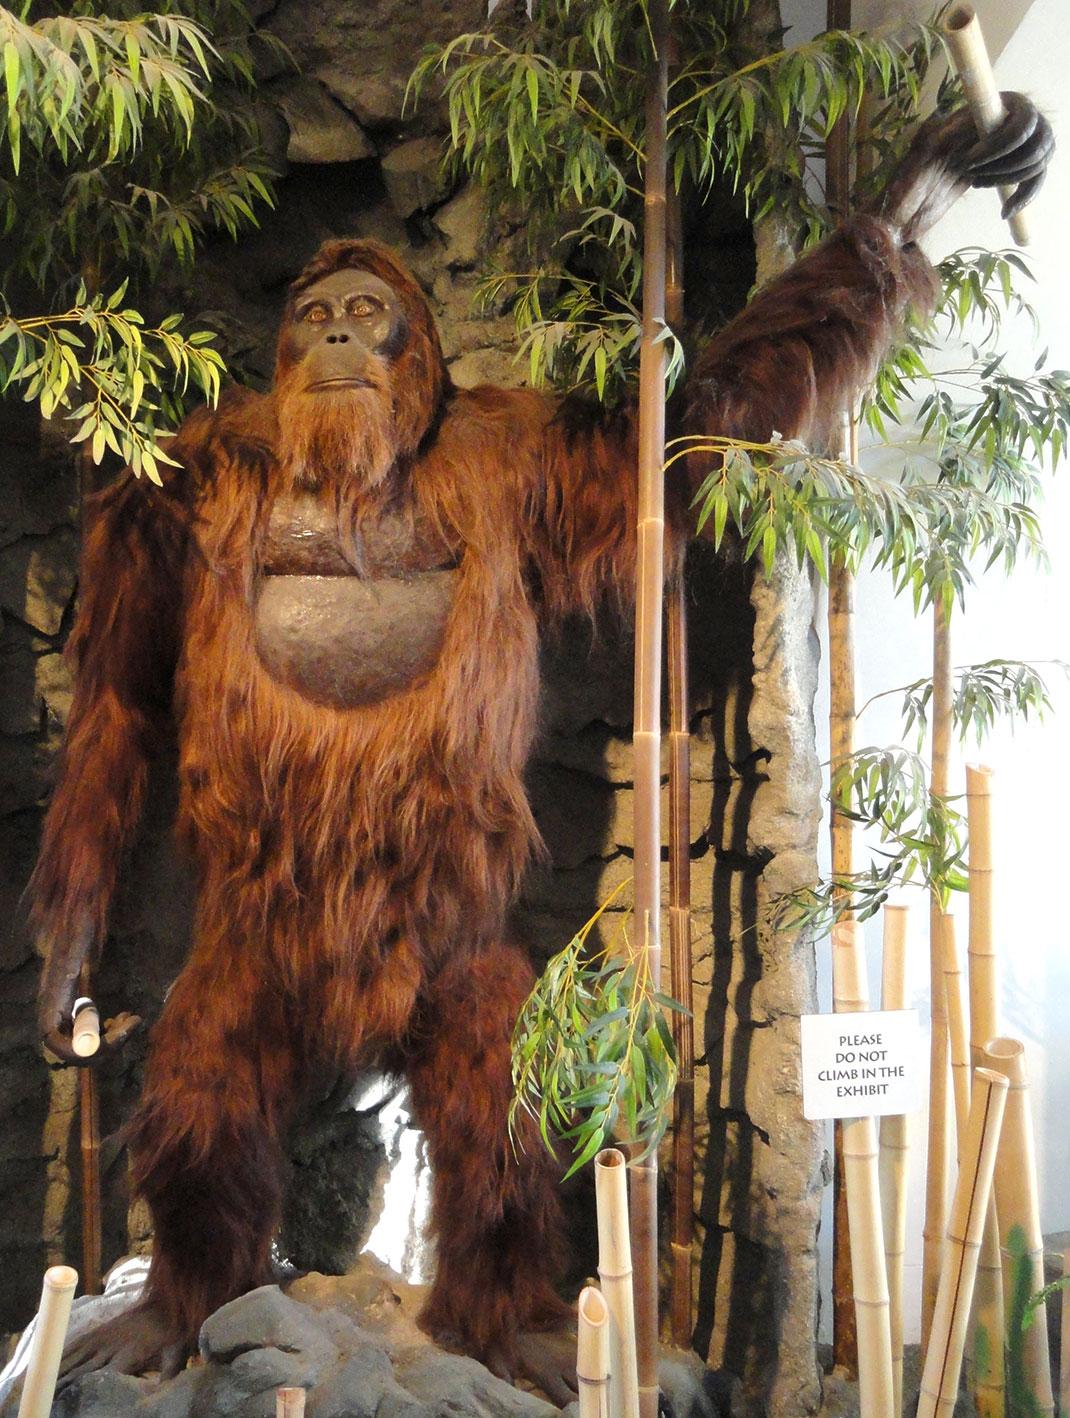 giganthopitheque-primate